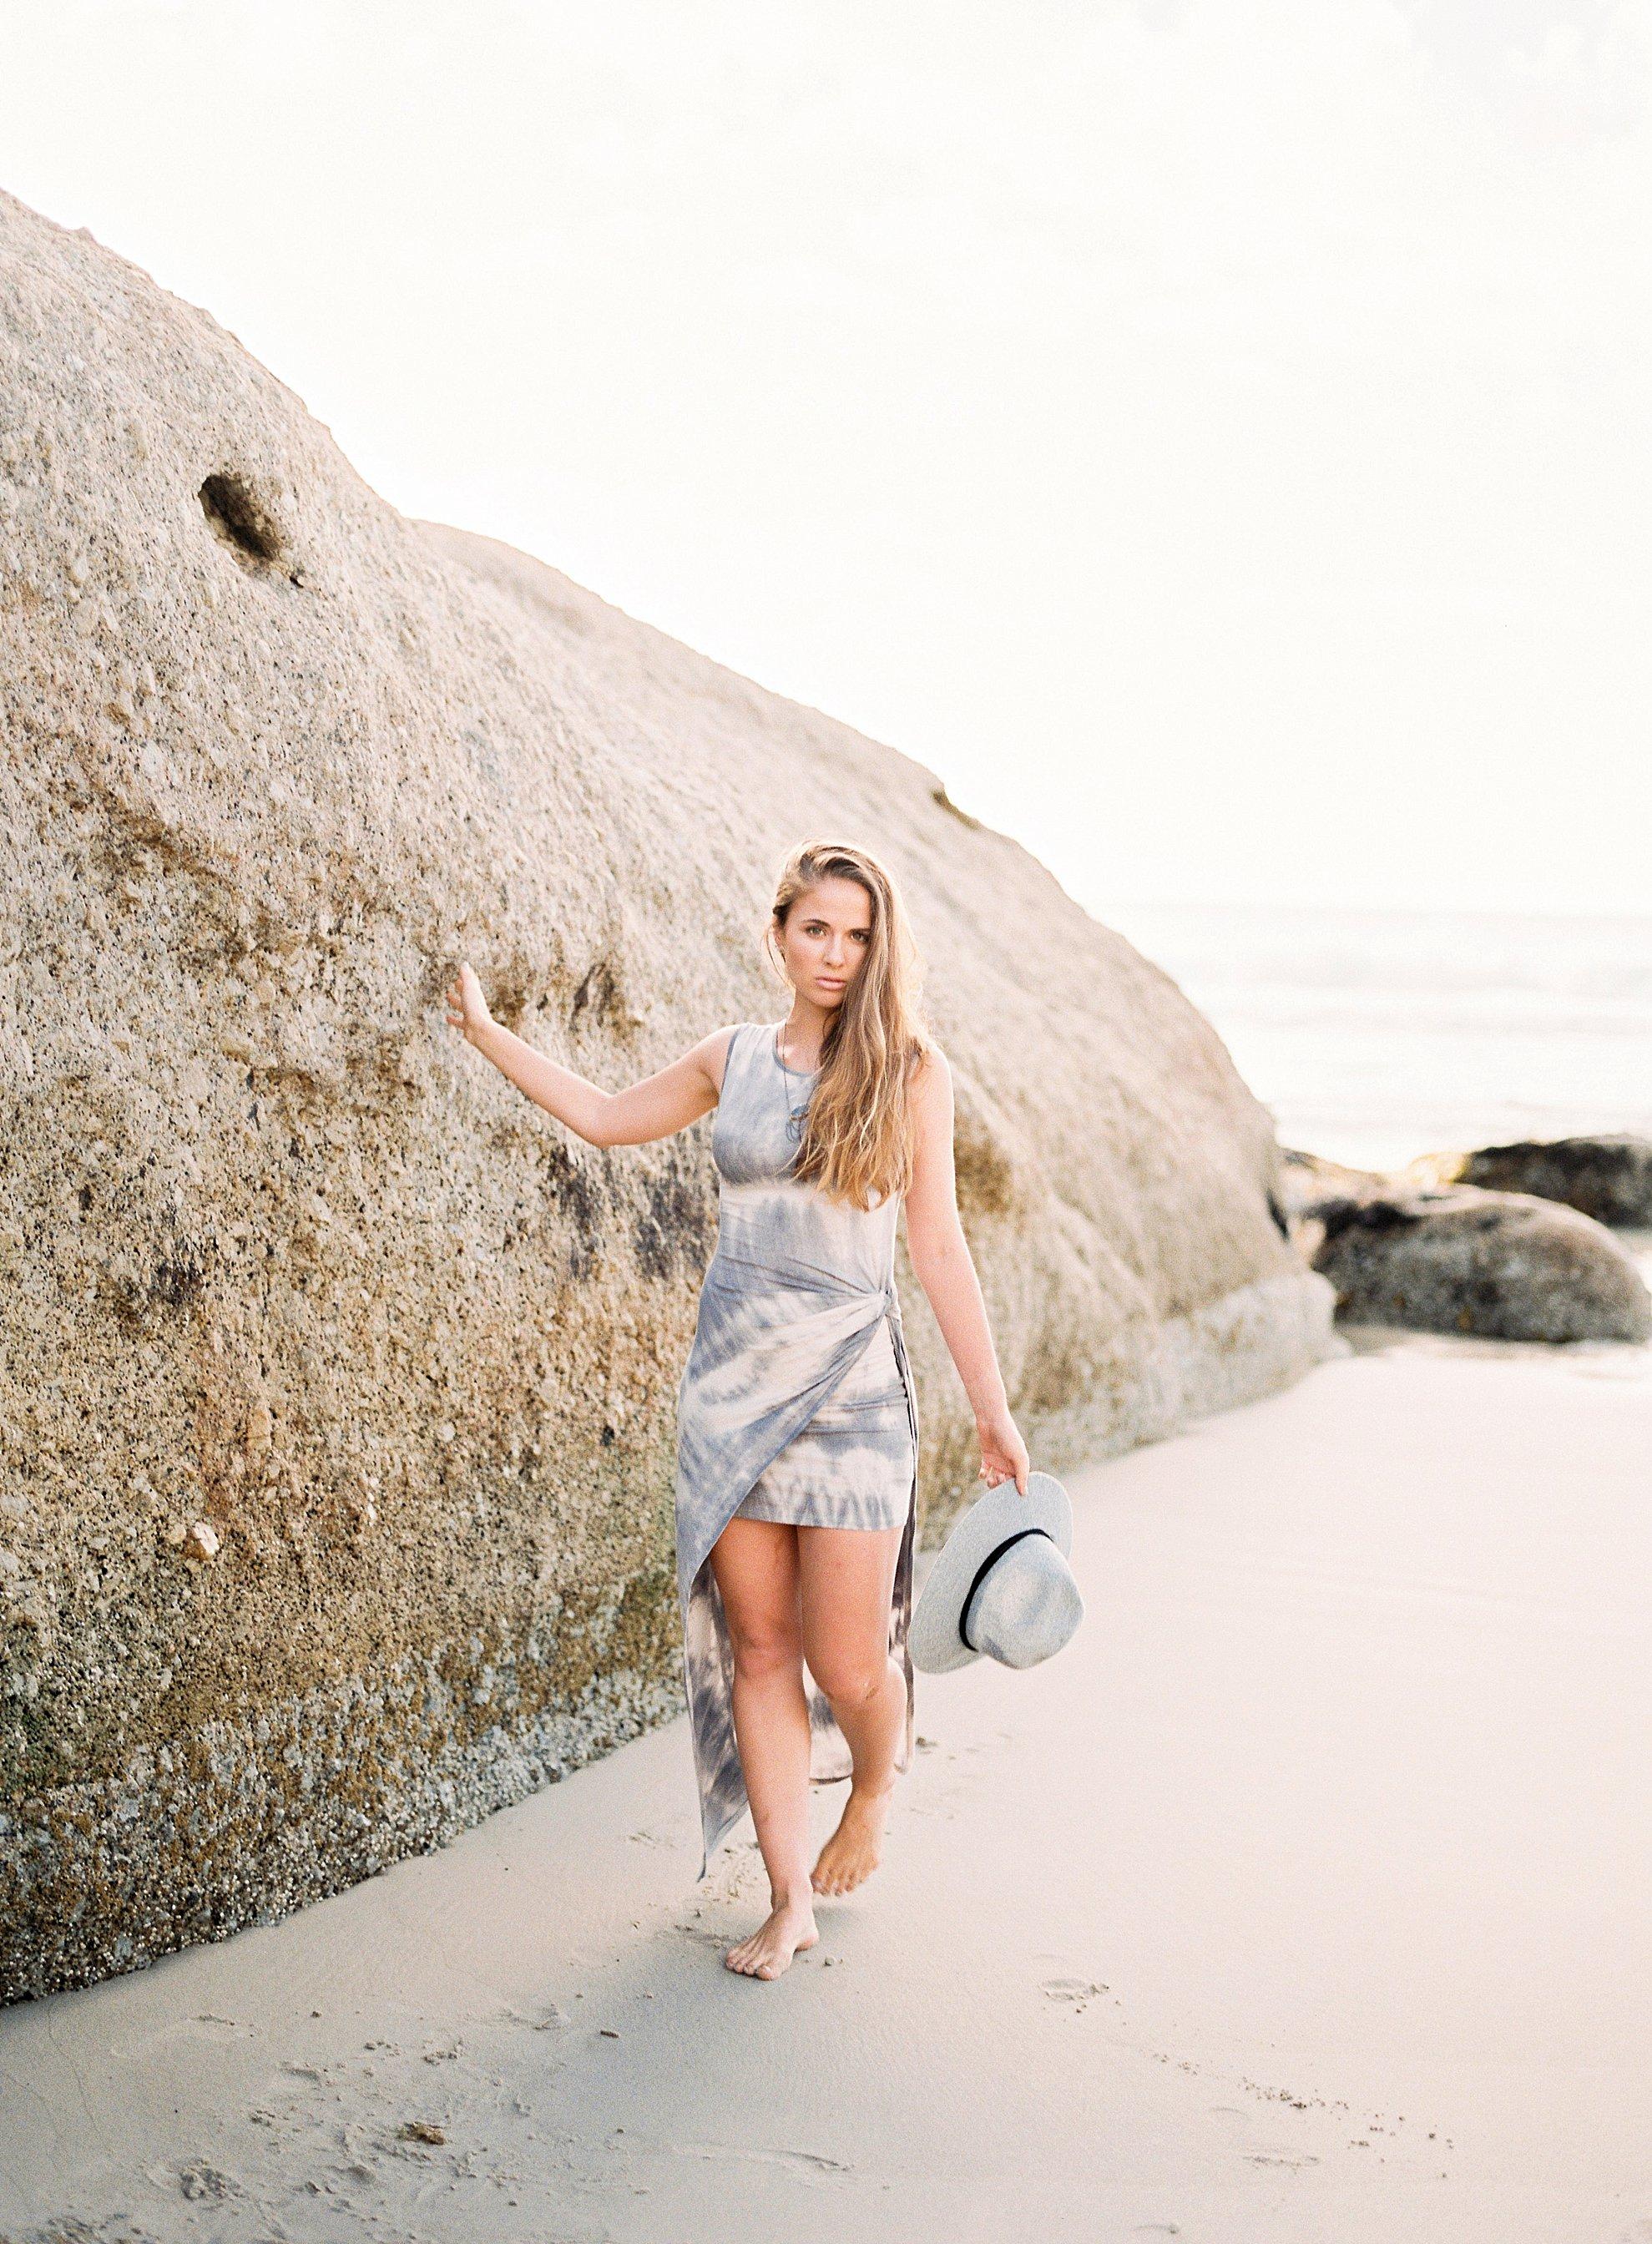 Amanda-Drost-photography-editorial-South-Africa-fashion-fotografie-mode-Zuid-Afrika_0012.jpg